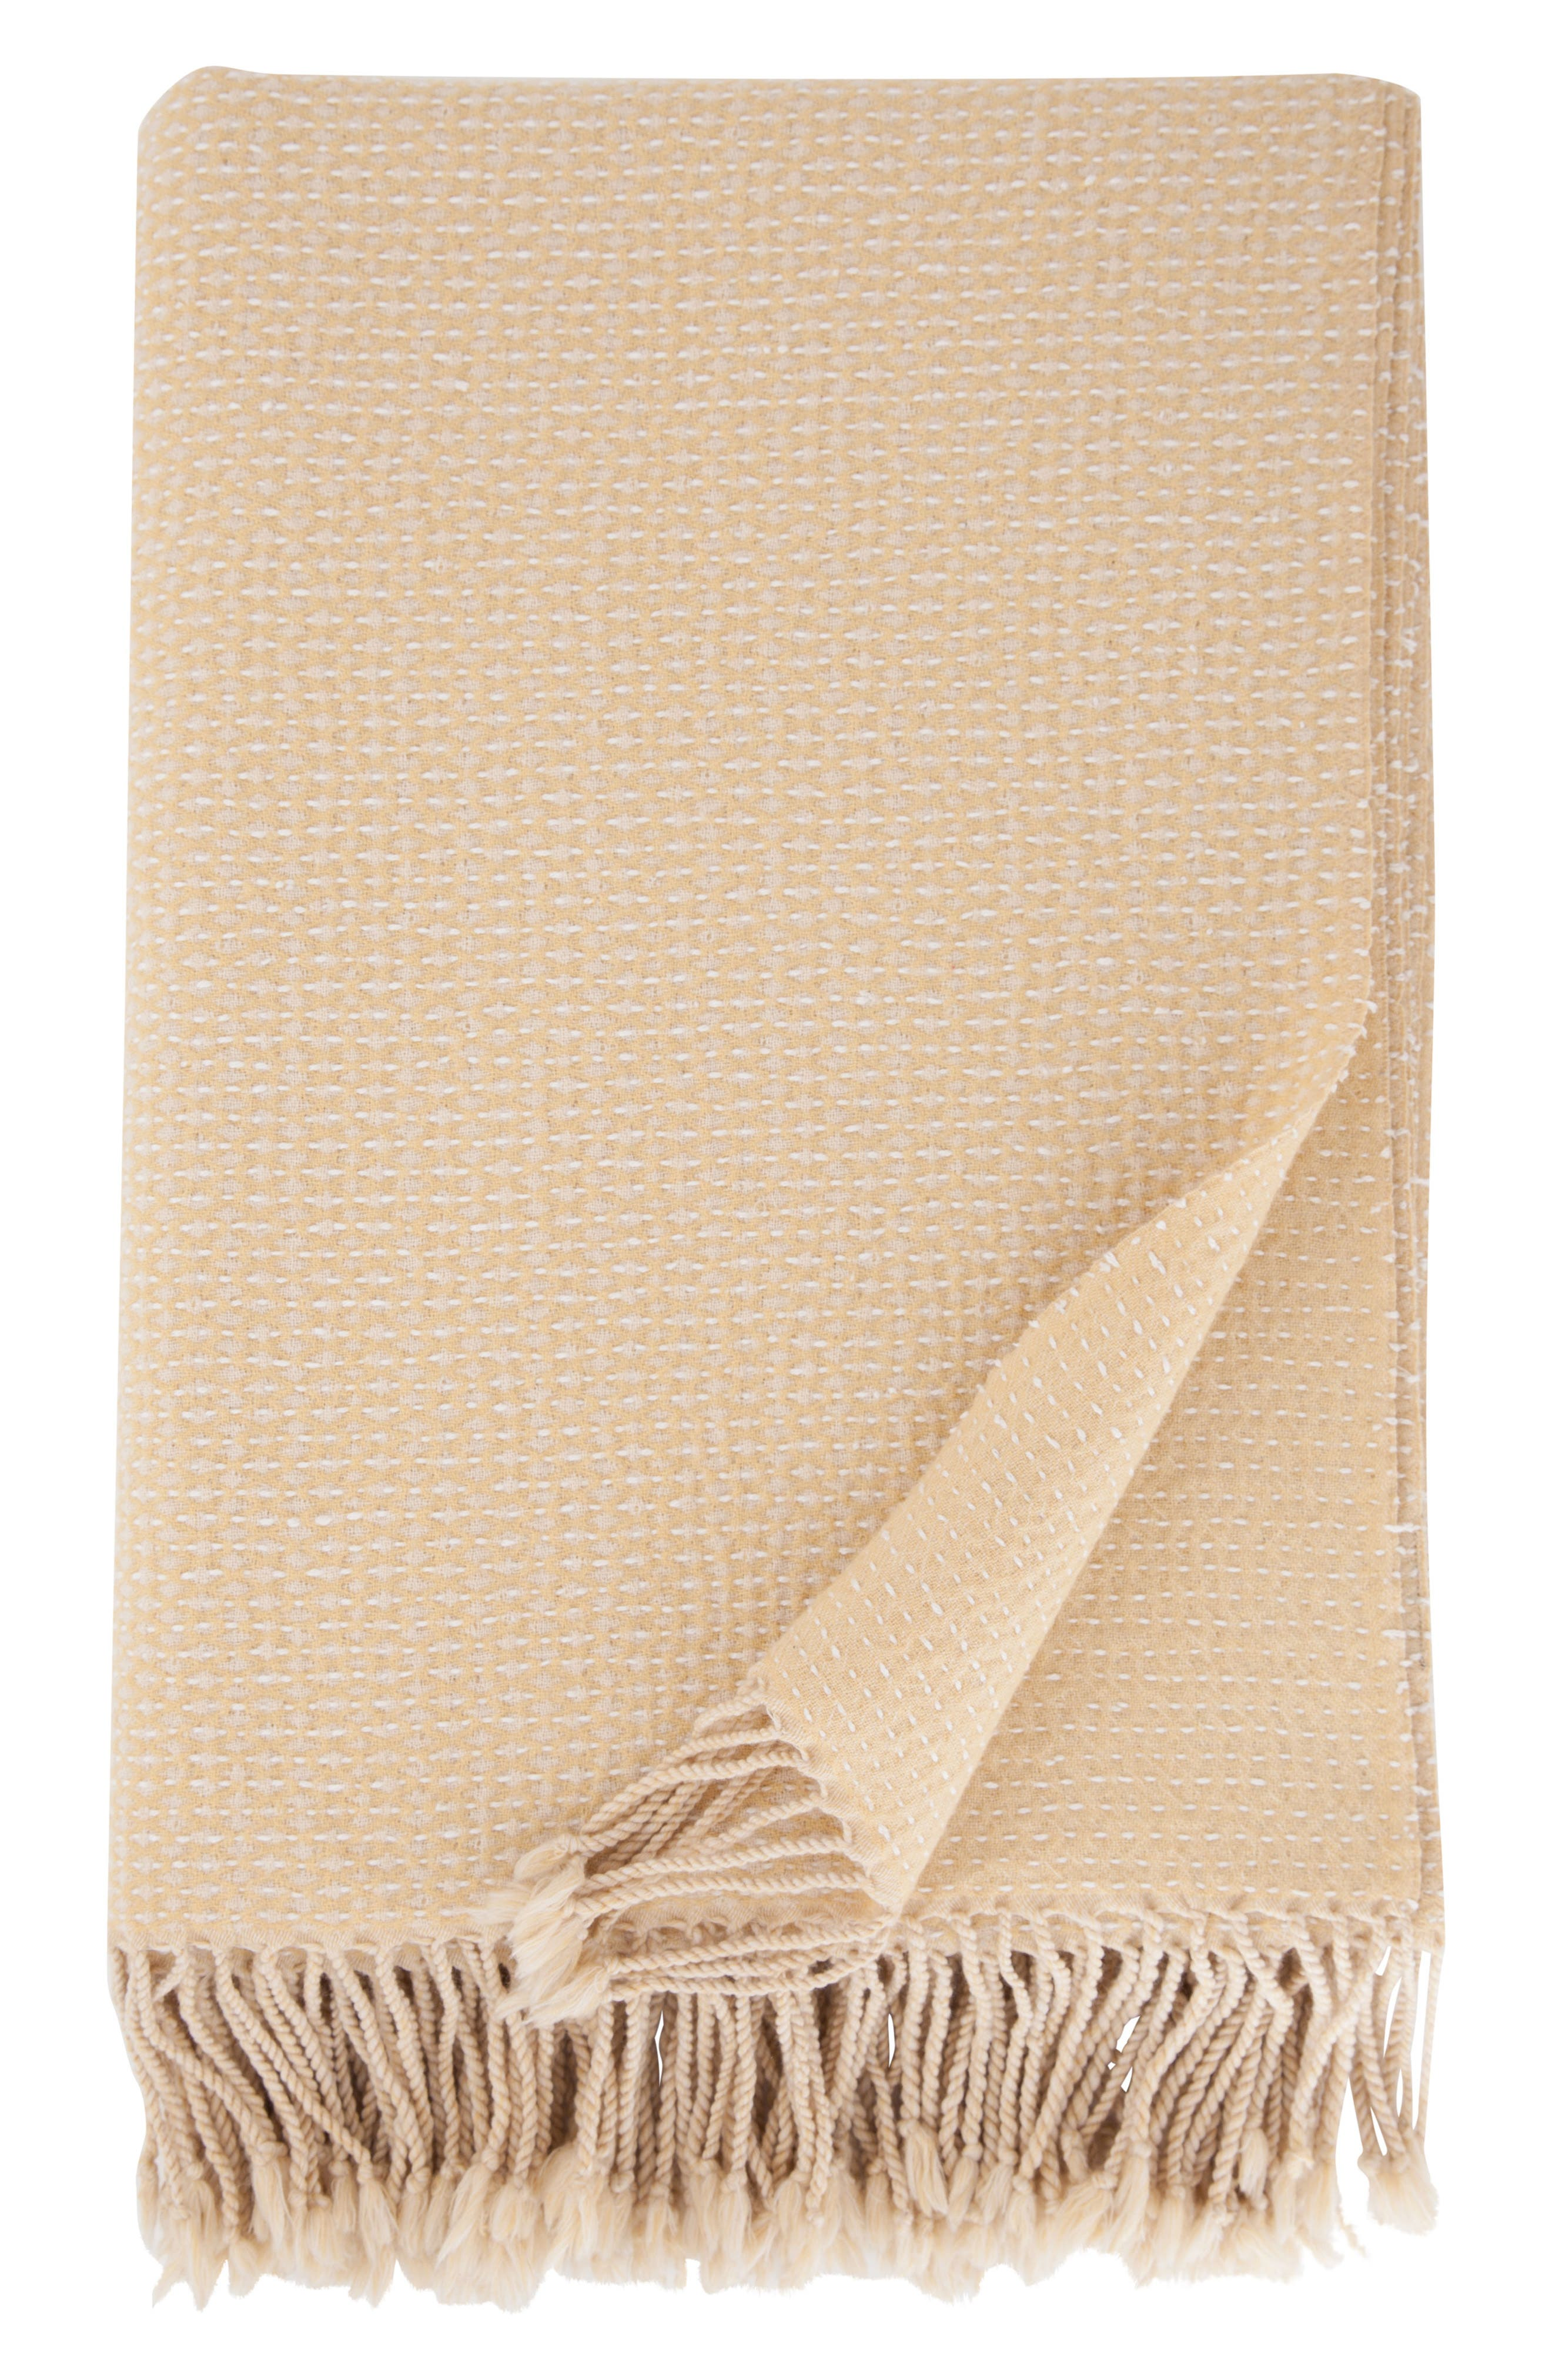 Modern Staples Hand Embroidered Merino Wool Blanket